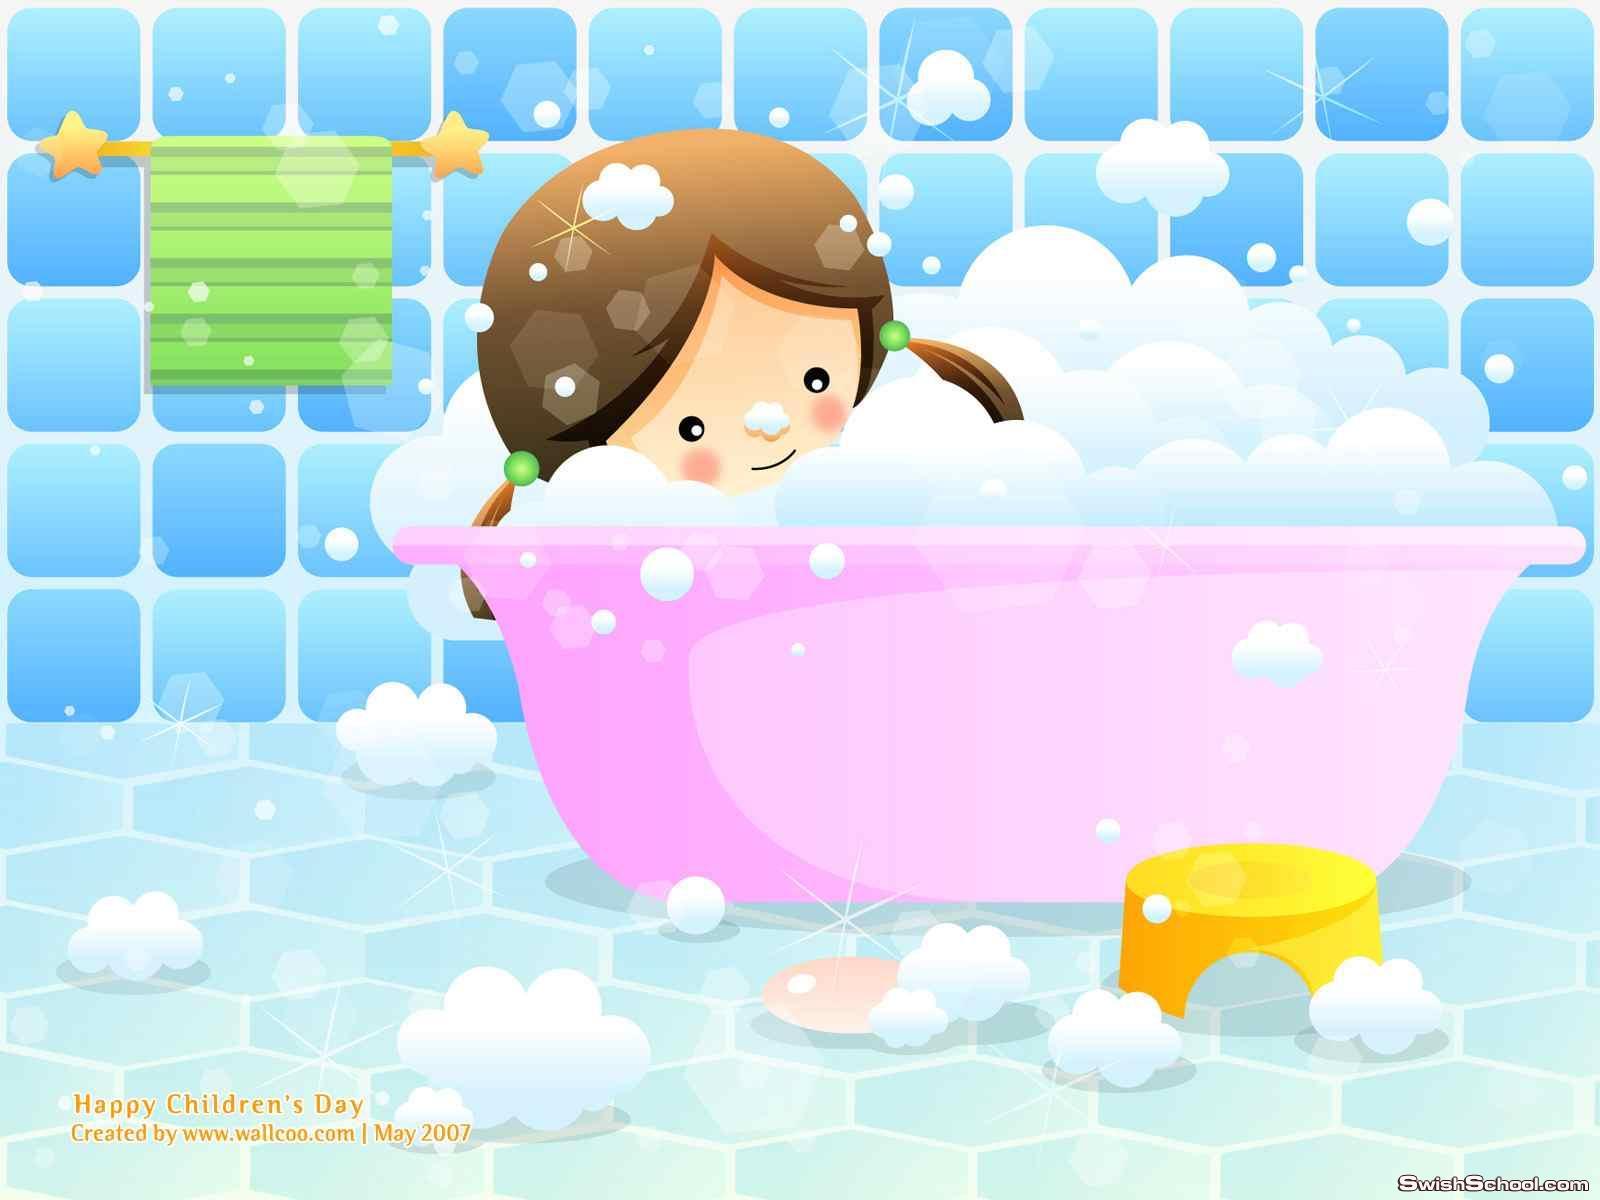 بليز خلفيات بانيو استحمام